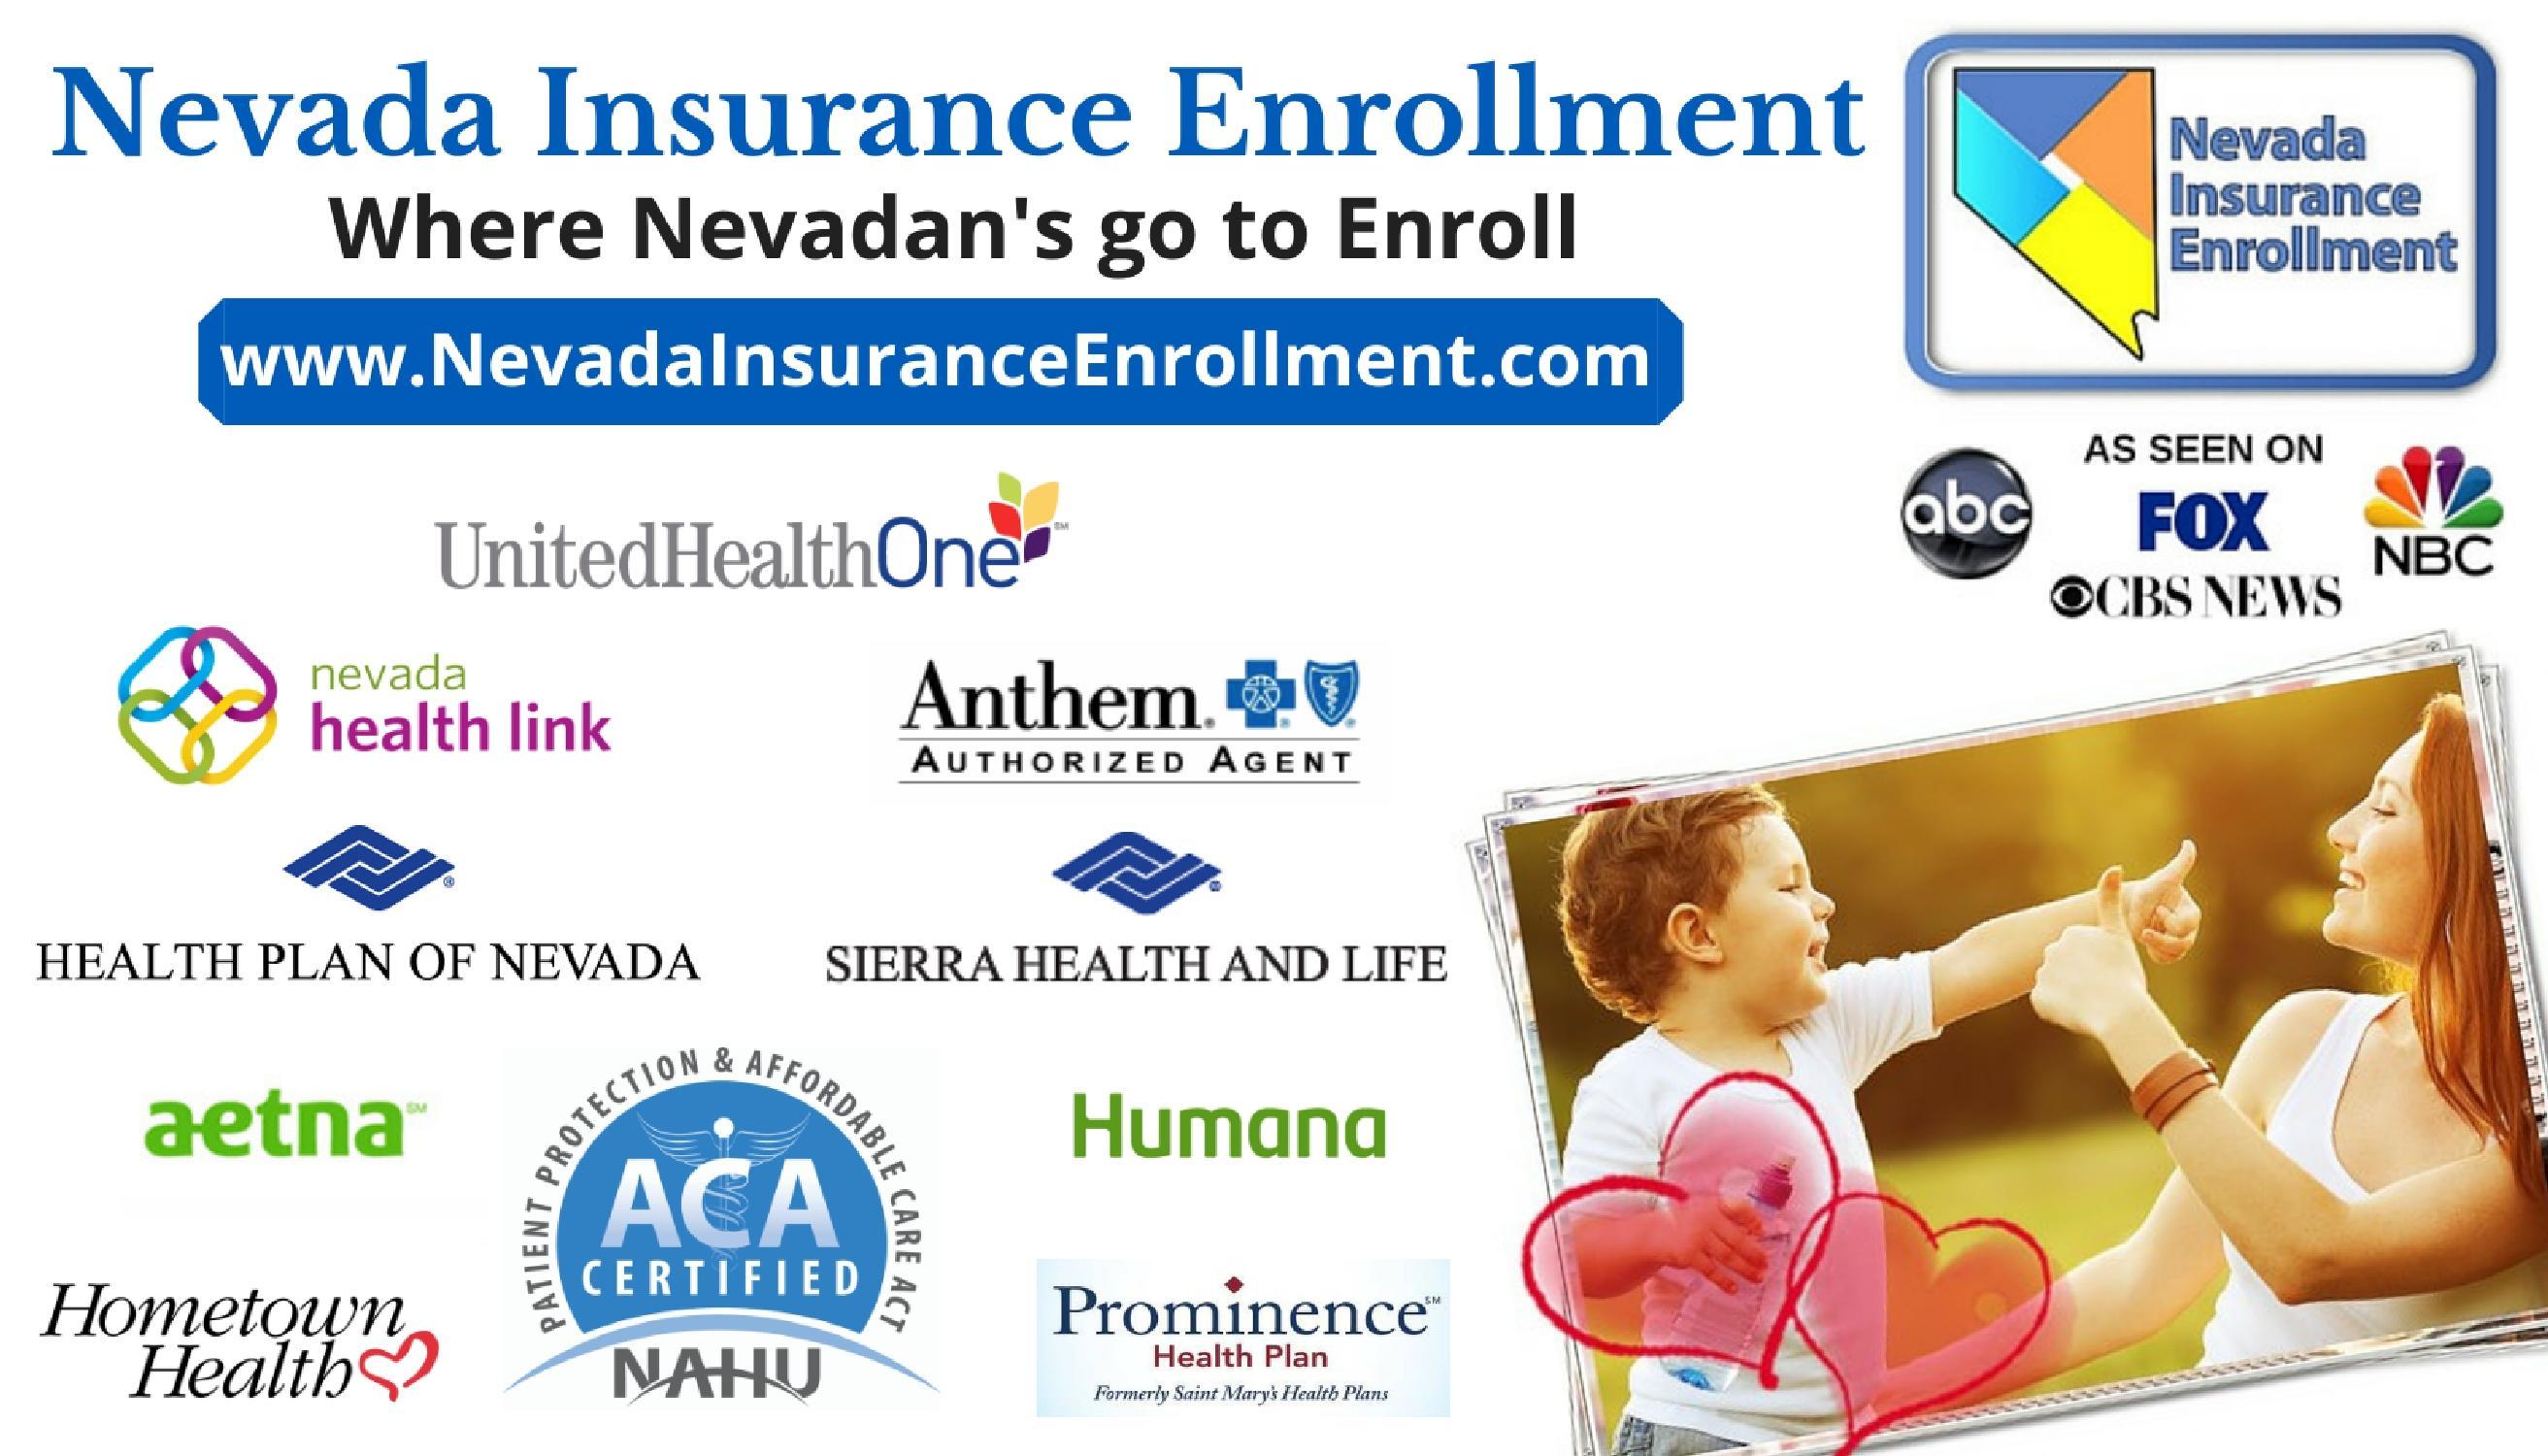 Nevada Insurance Enrollment   Auto, Homeowners, Health, Life image 6